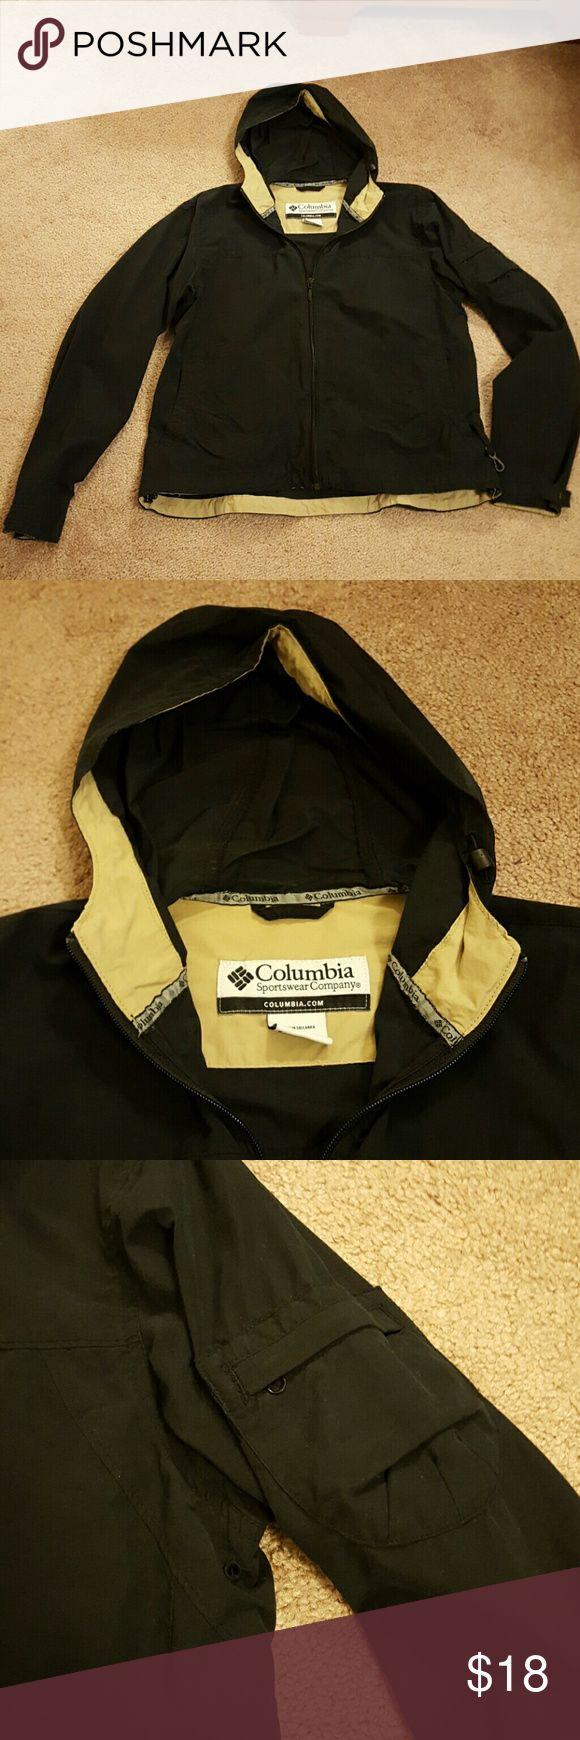 Columbia hooded jacket Columbia Sportswear Company hooded jacket. Drawstring at waist, snap cuffs, zippered pocket on sleeve. Like new! Columbia Jackets & Coats Utility Jackets